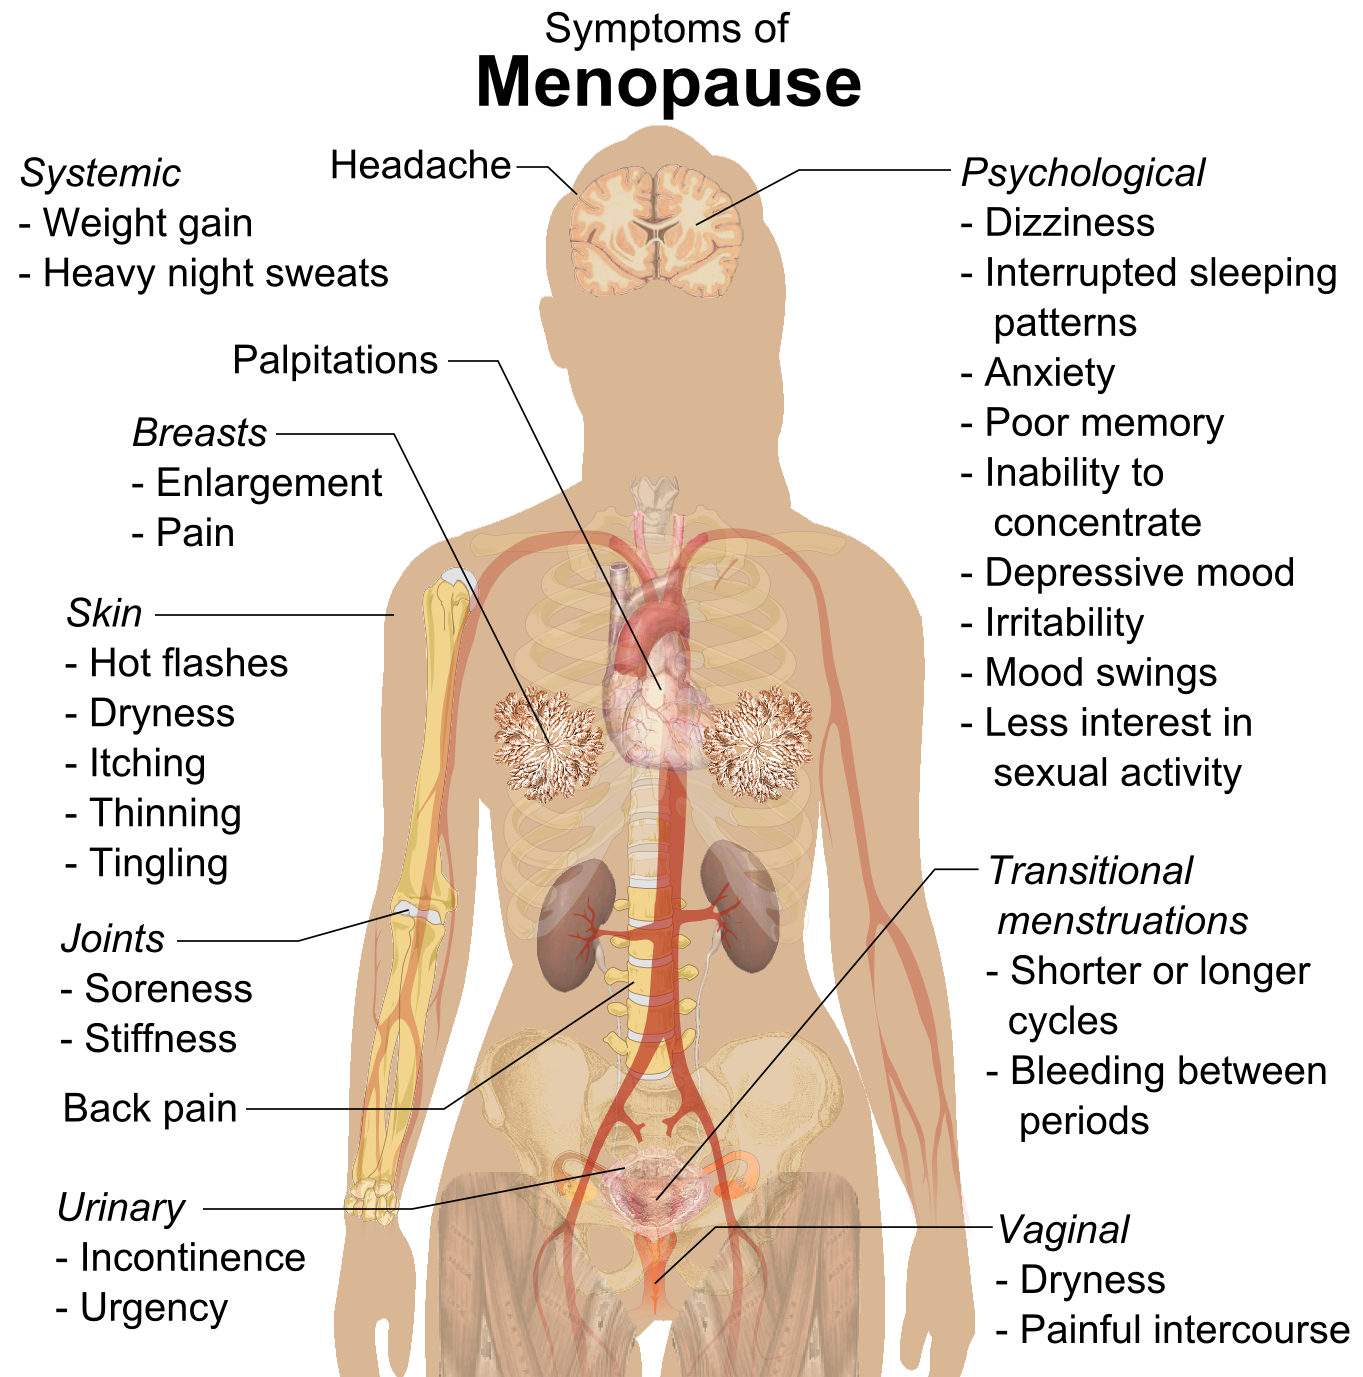 Filesymptoms Of Menopause Rasterg Wikimedia Commons